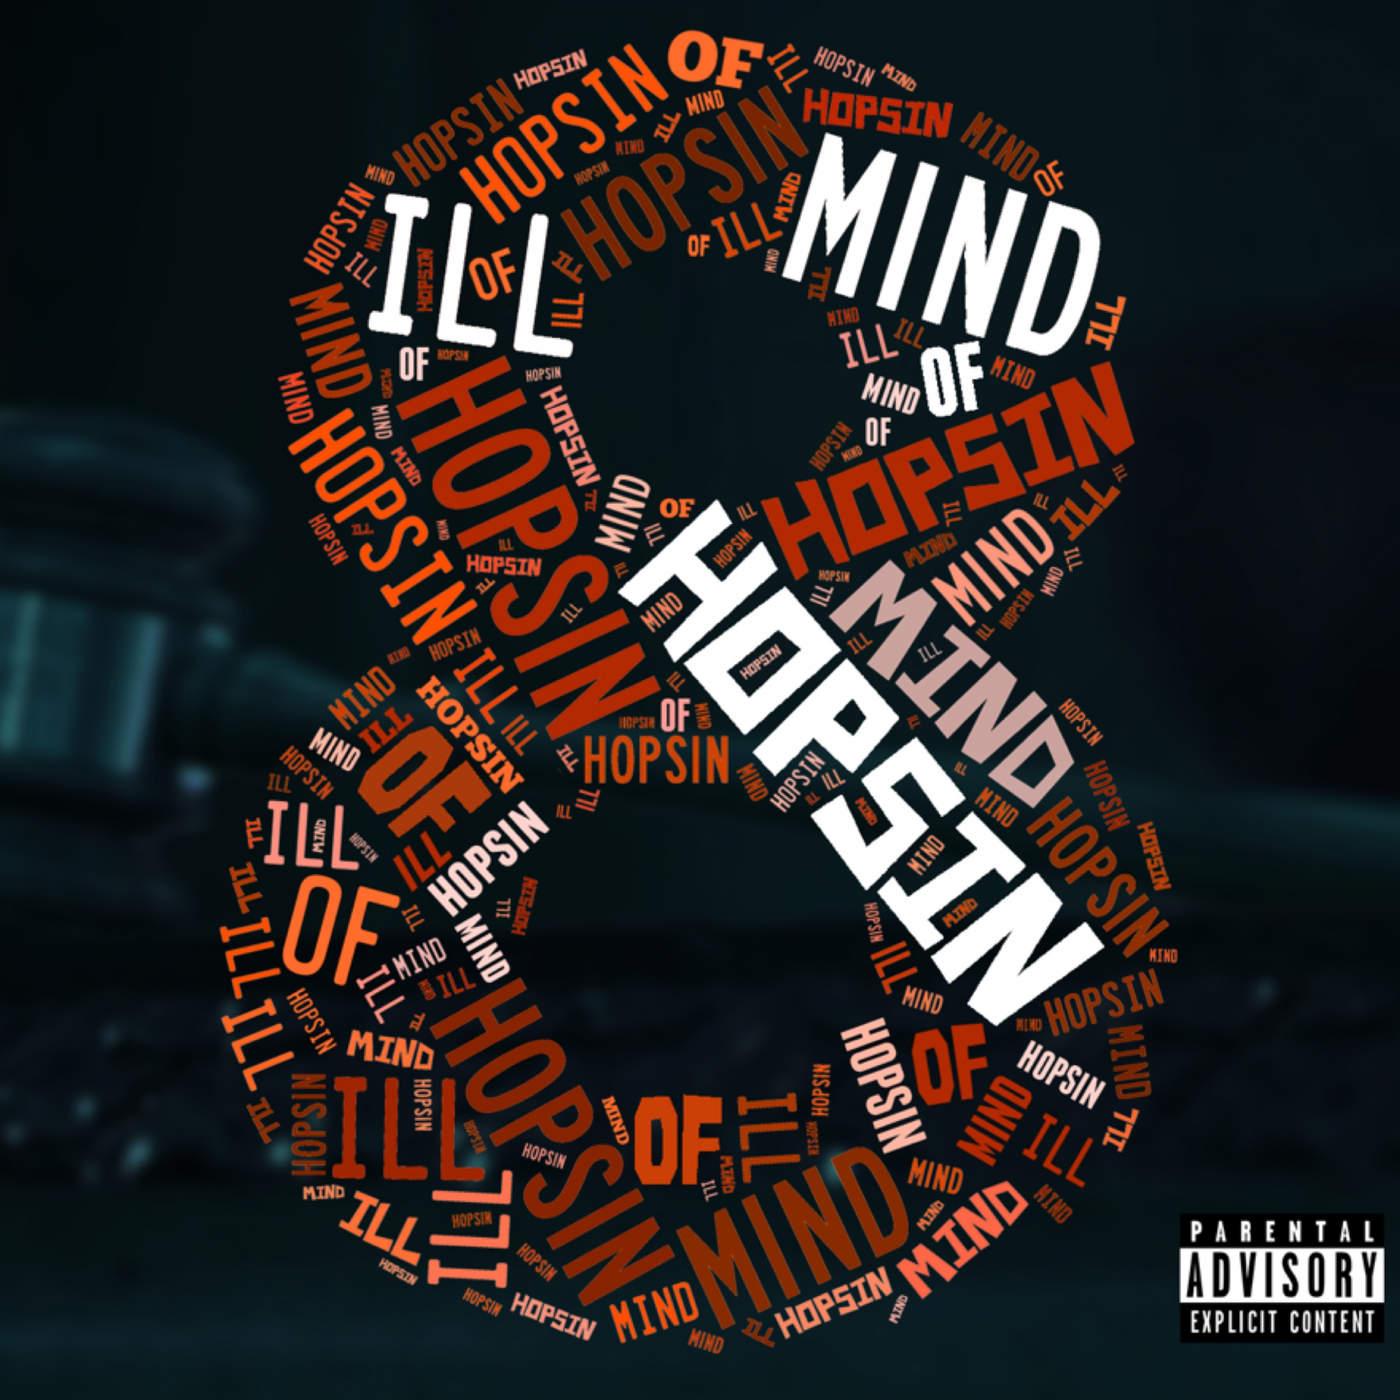 Hopsin - Ill Mind of Hopsin 8 - Single Cover